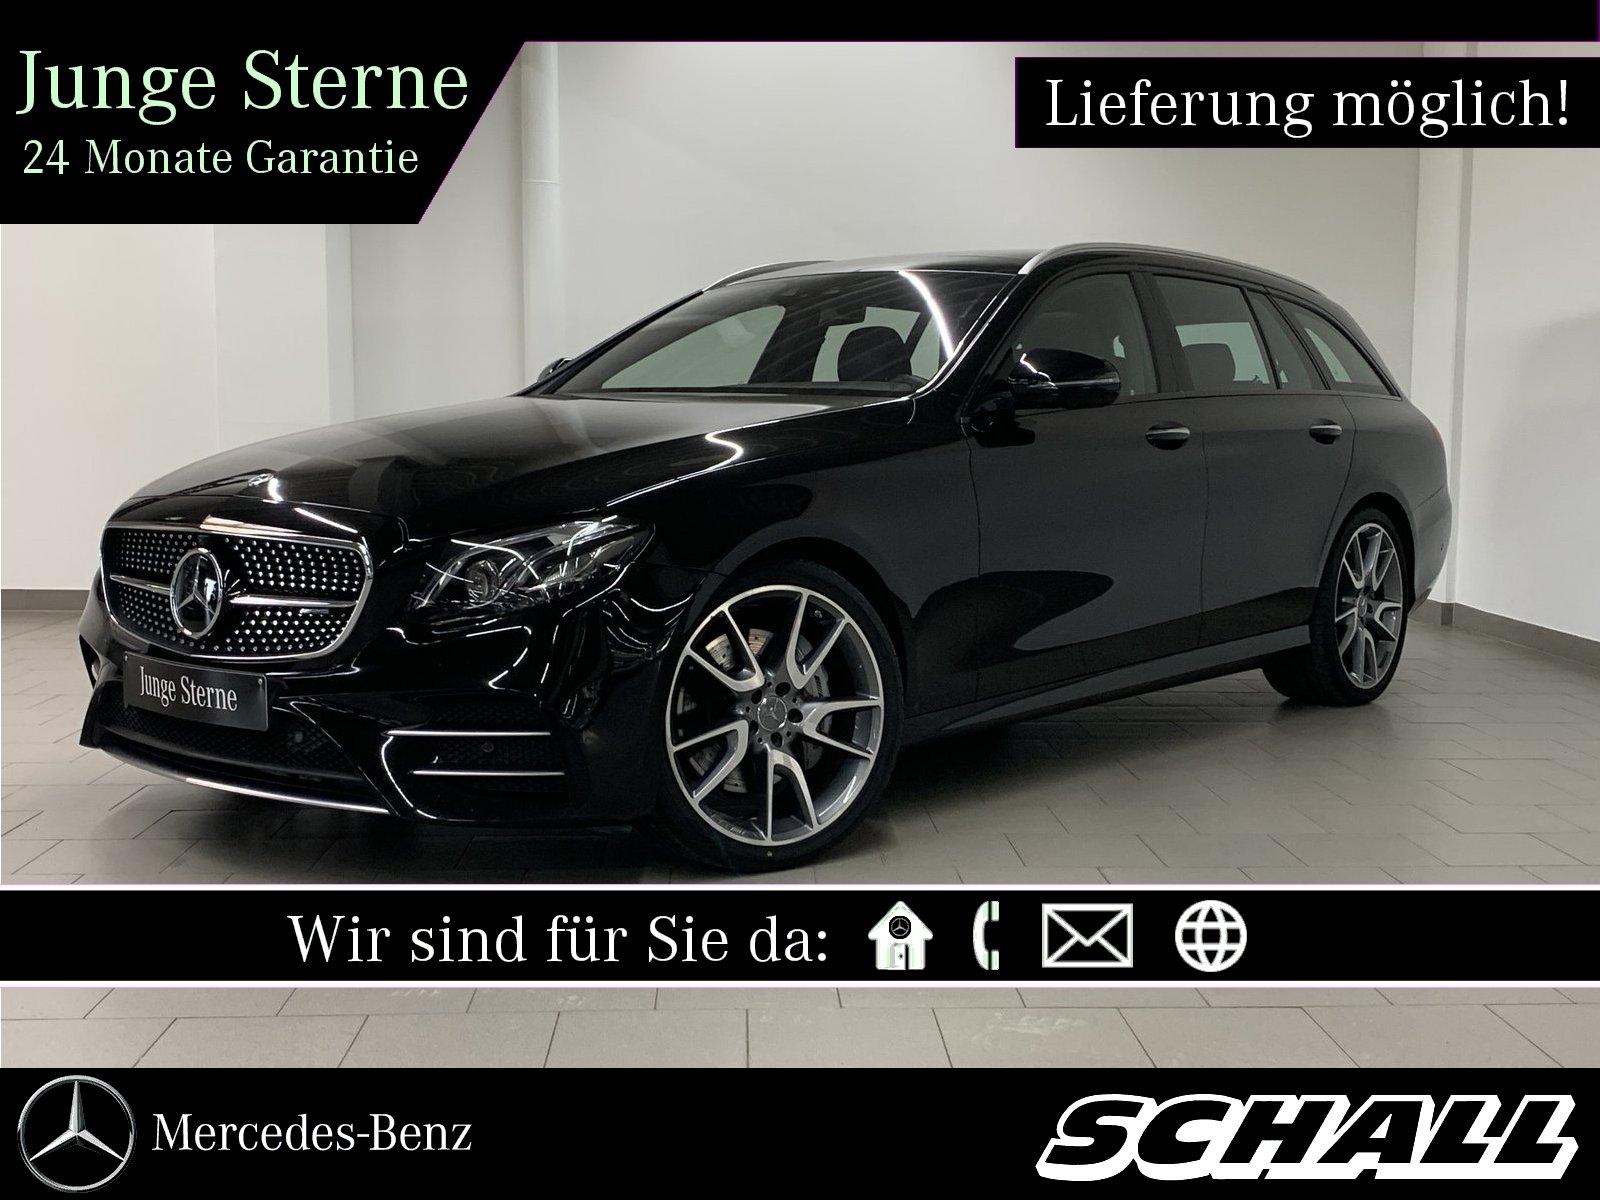 Mercedes-Benz E 43 AMG 4M T PANO+MULTIBEAM+DISTR+360°+MEMORY, Jahr 2017, Benzin